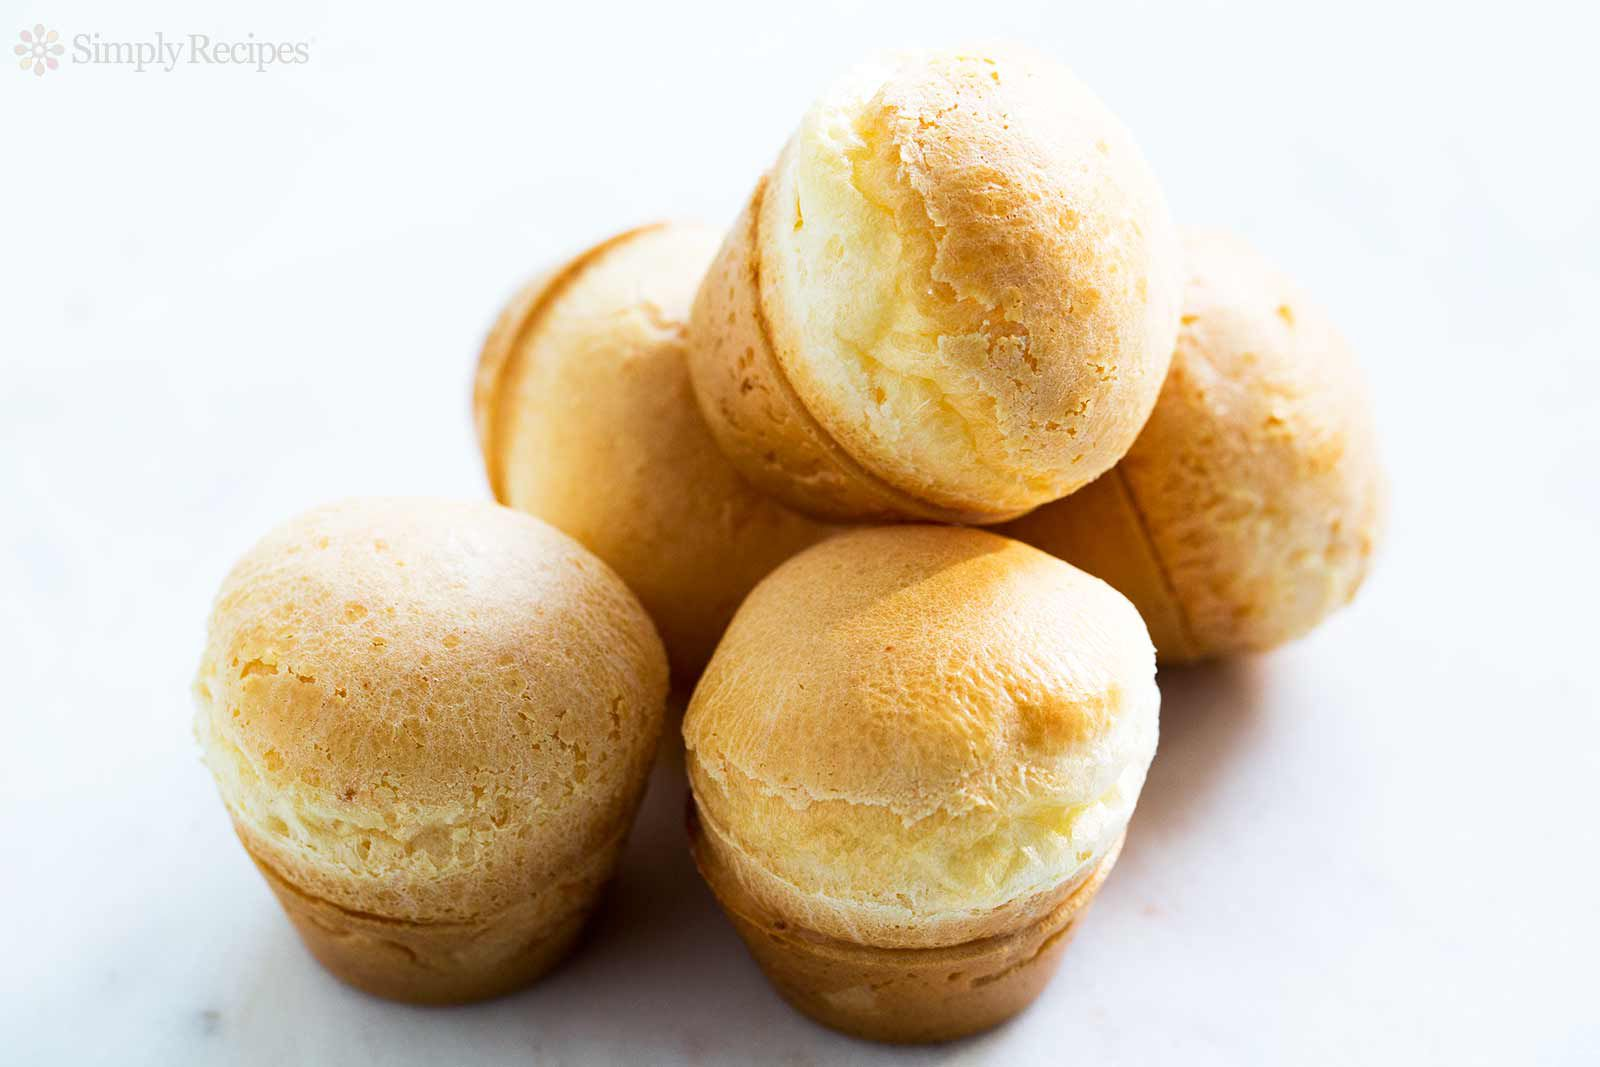 Easy Brazilian Cheese Bread (Pão de Queijo)